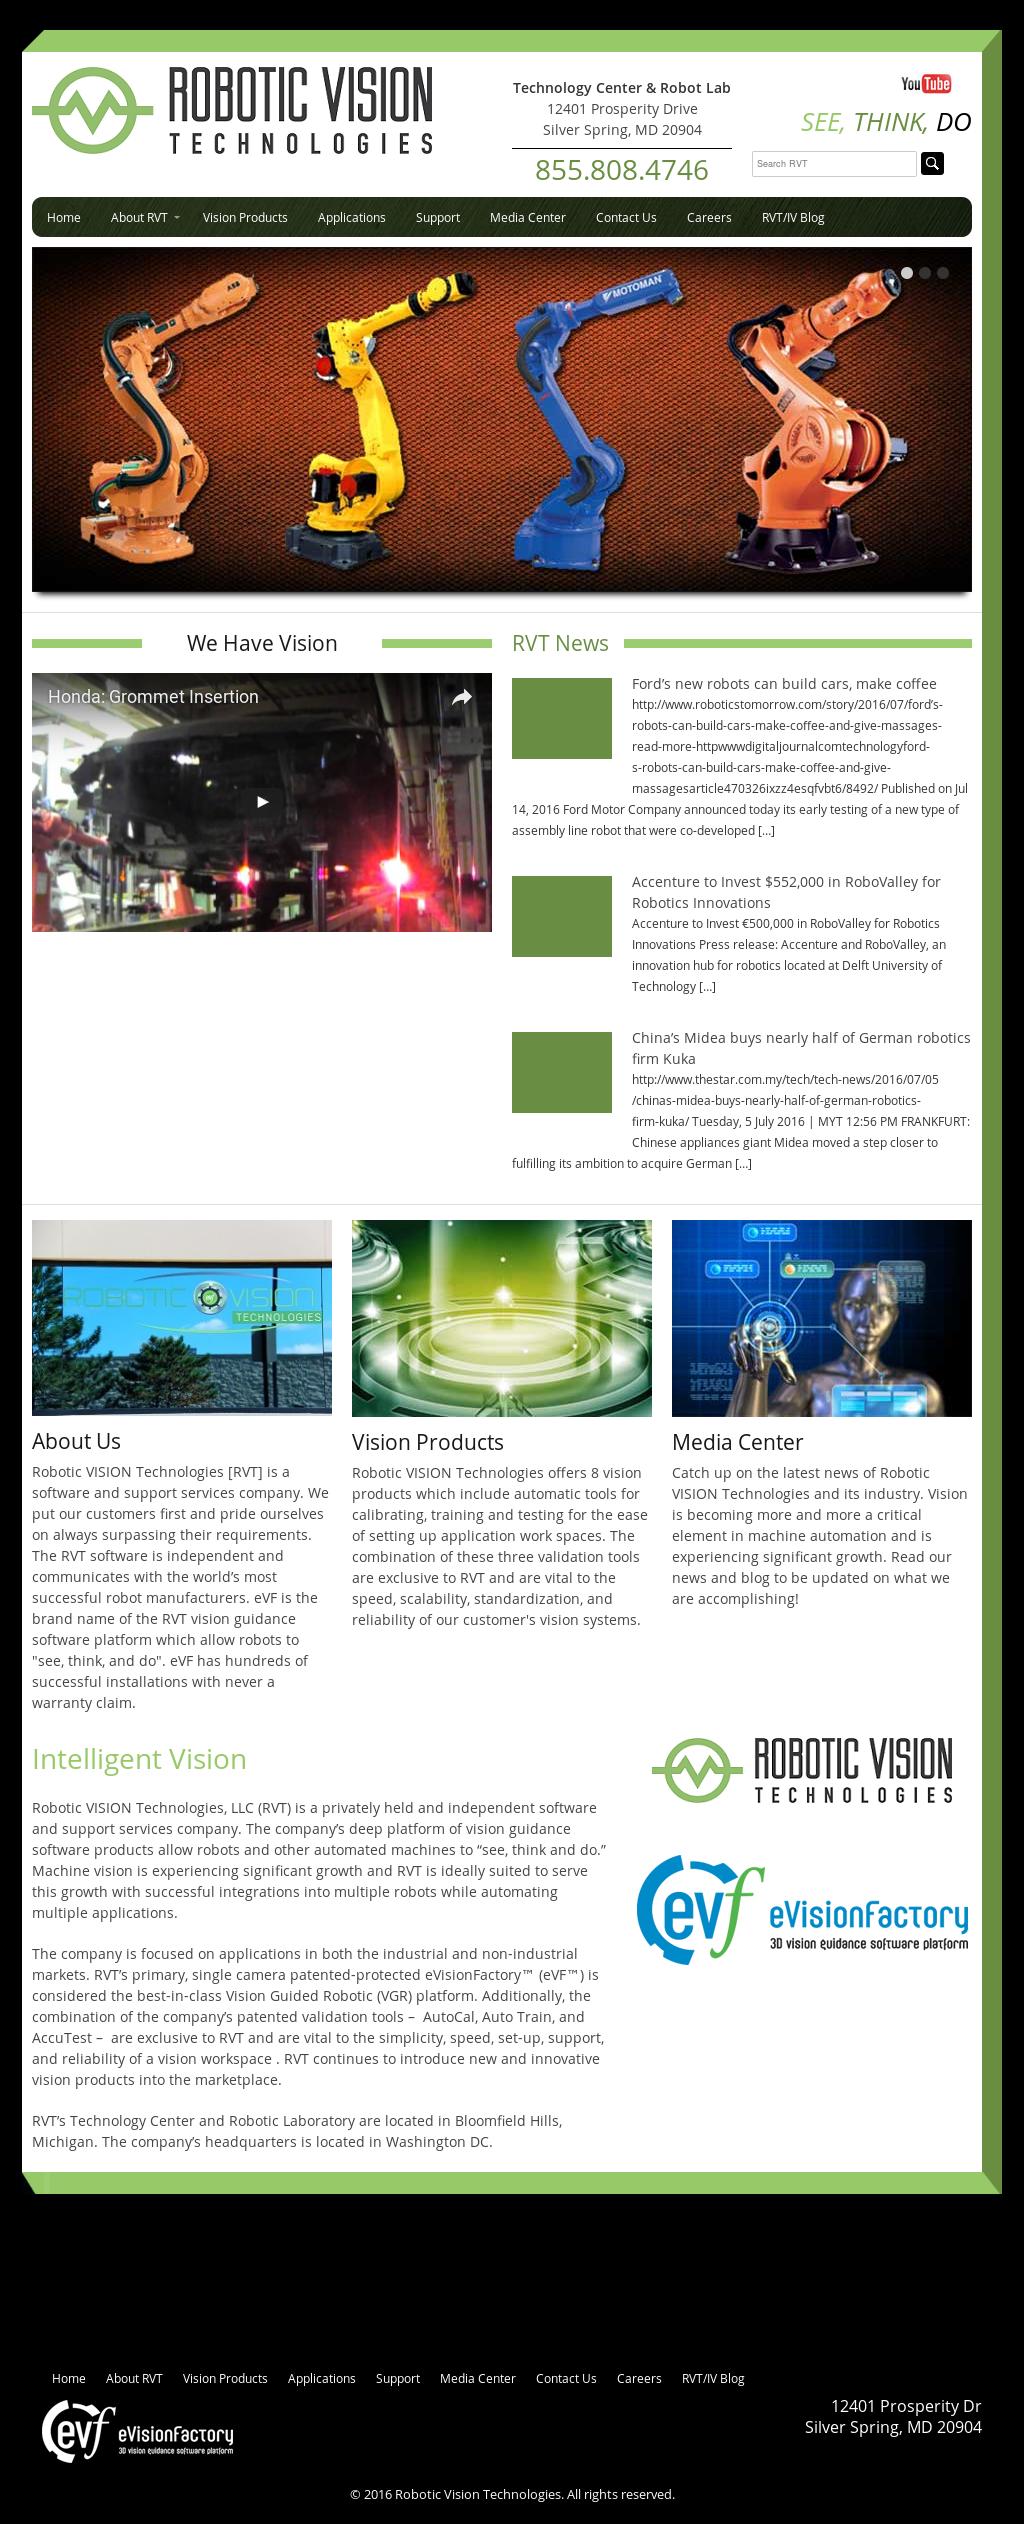 Robottic Vision Technologies Competitors, Revenue and